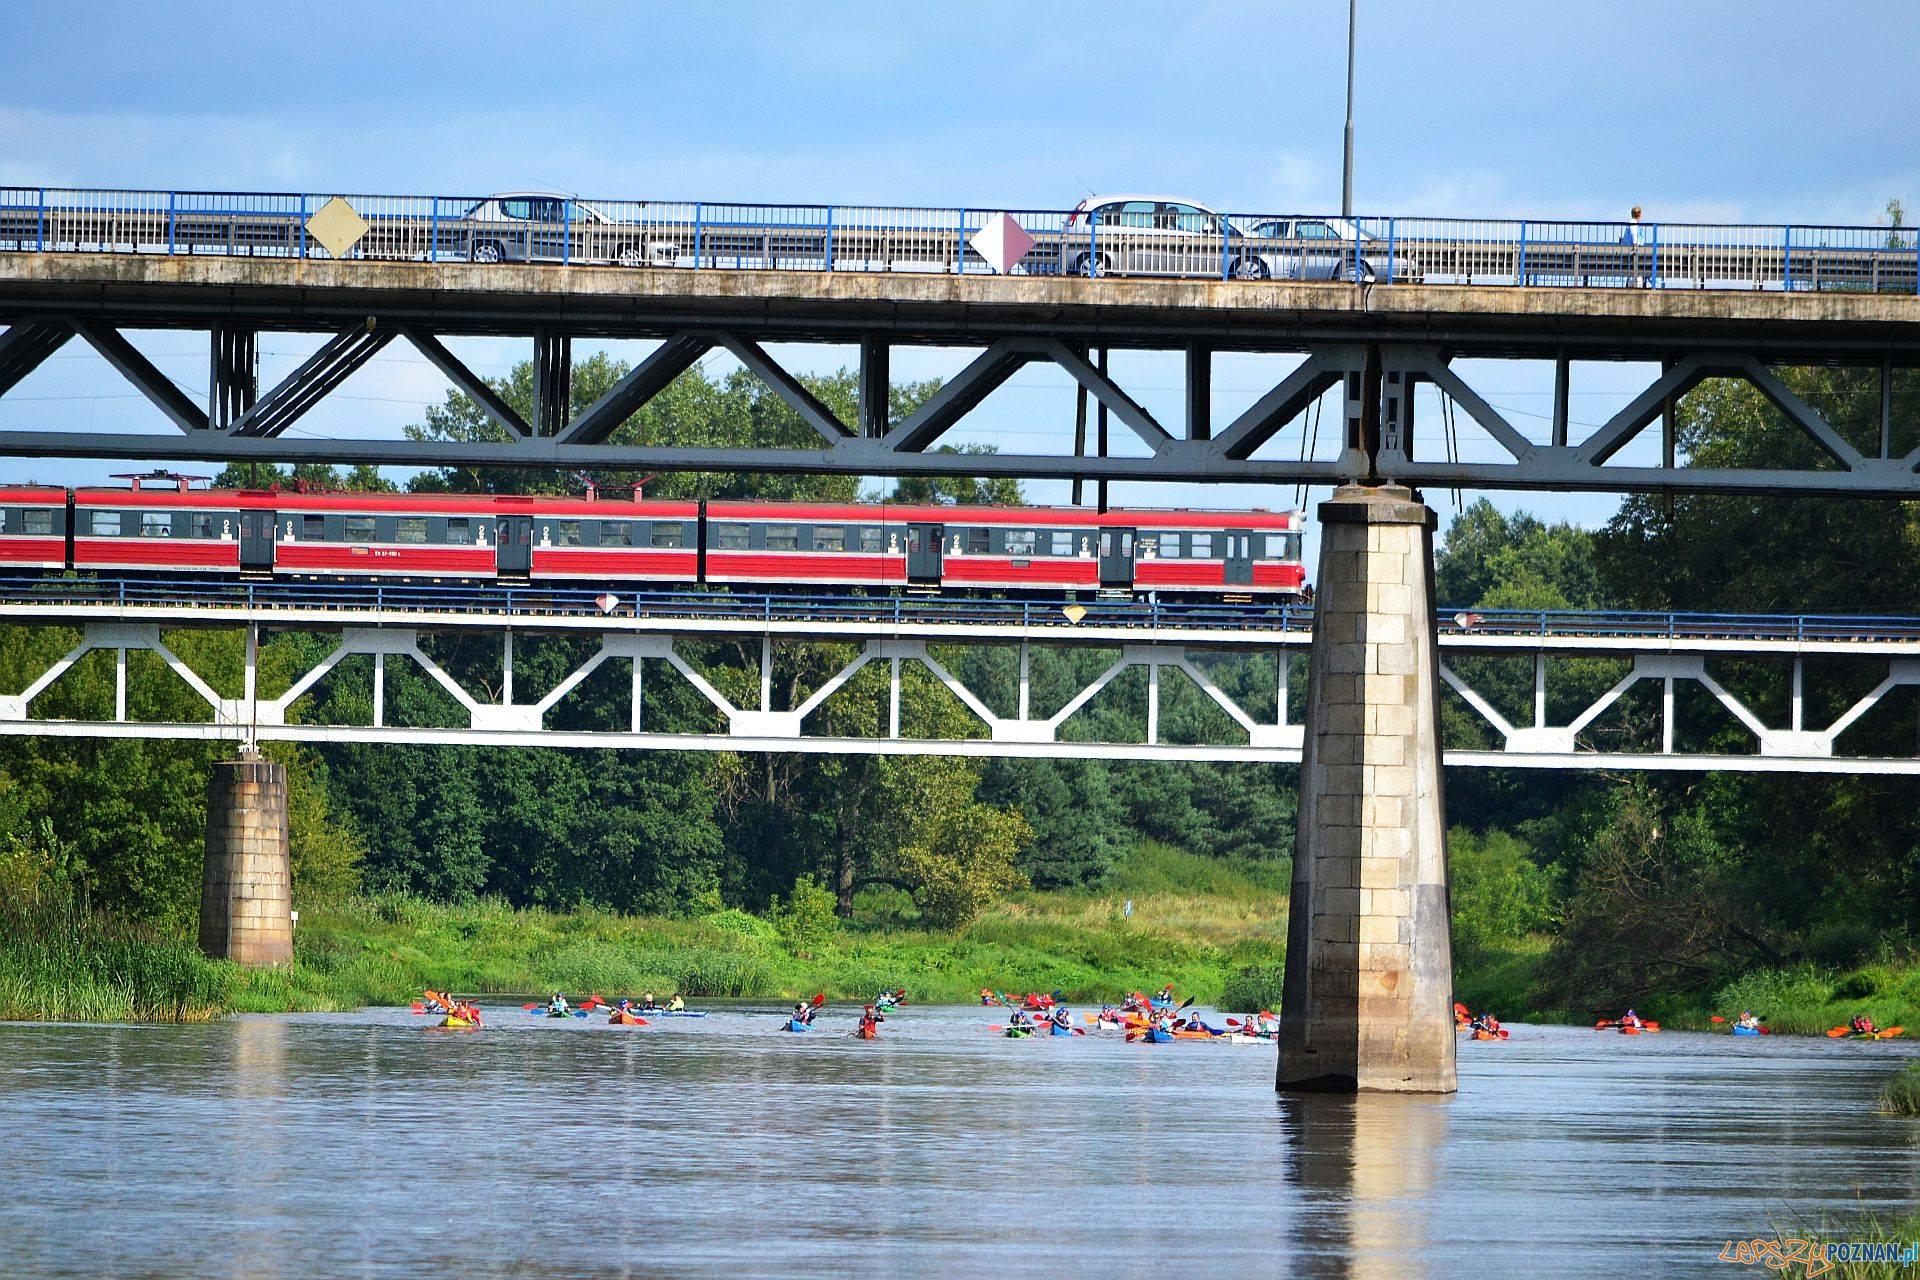 Mosty w Obornikach  Foto: Gmina Oborniki